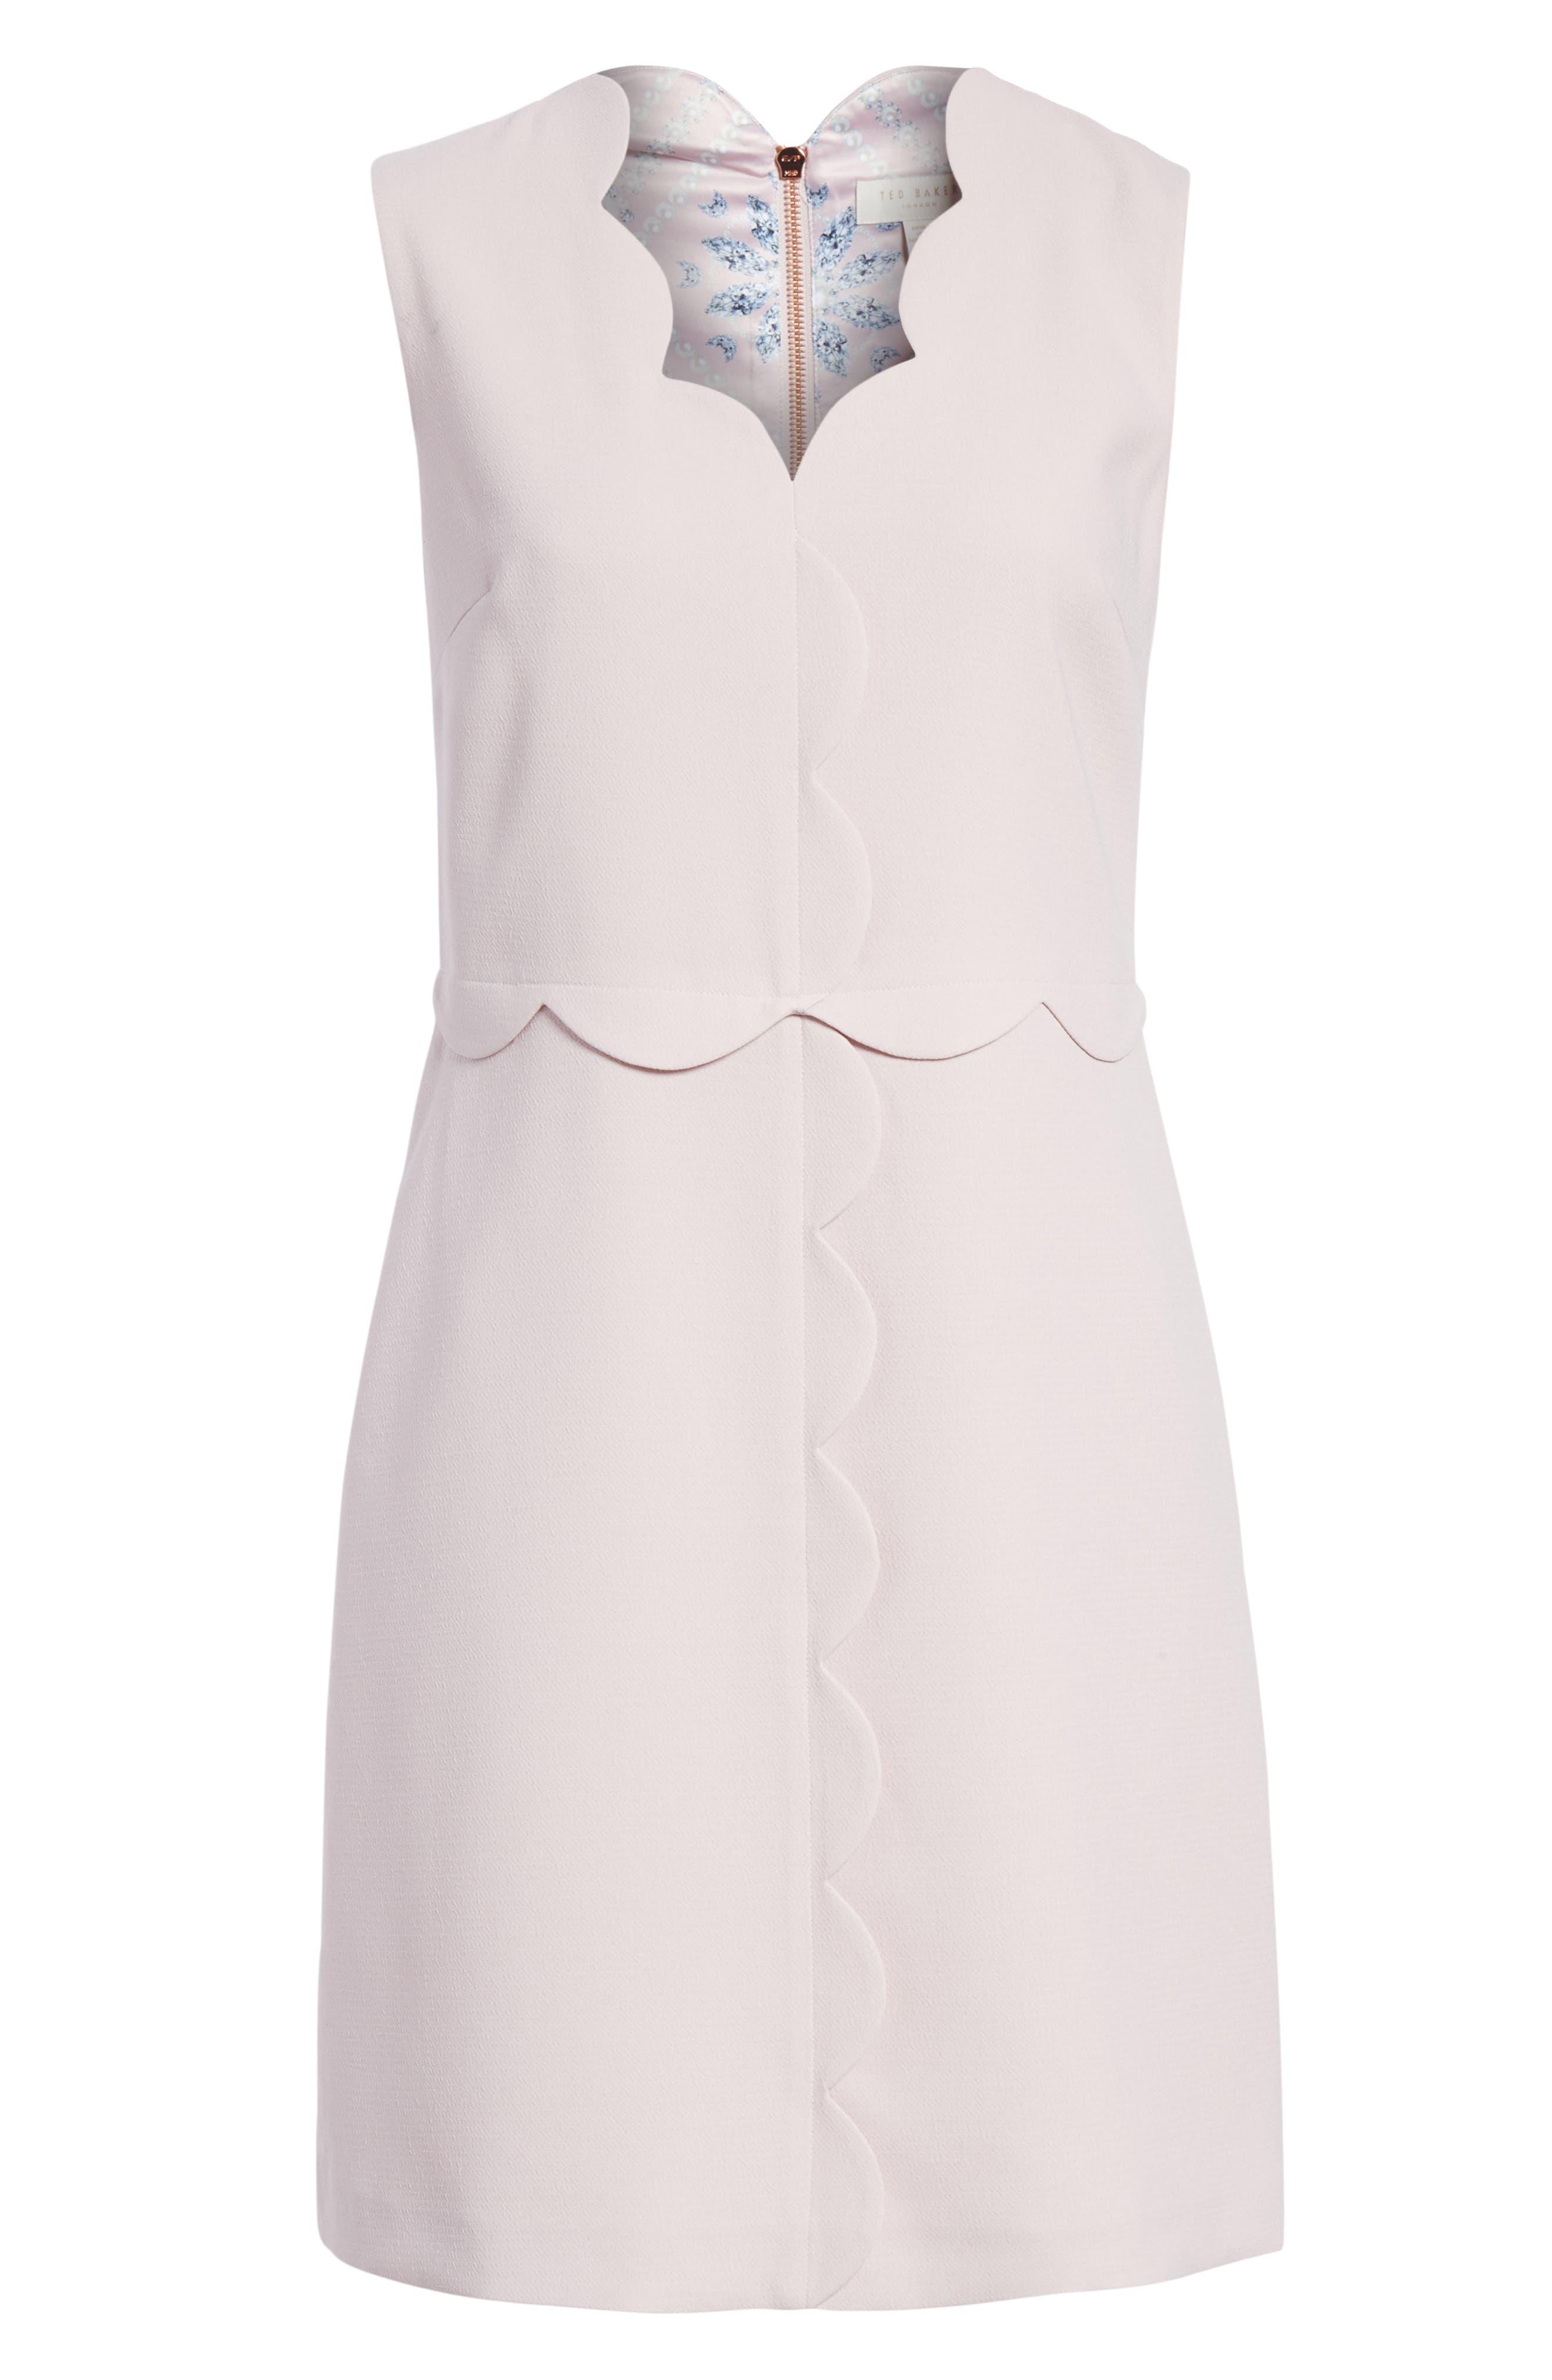 Scallop Edge Shift Dress,                             Alternate thumbnail 6, color,                             Dusky Pink